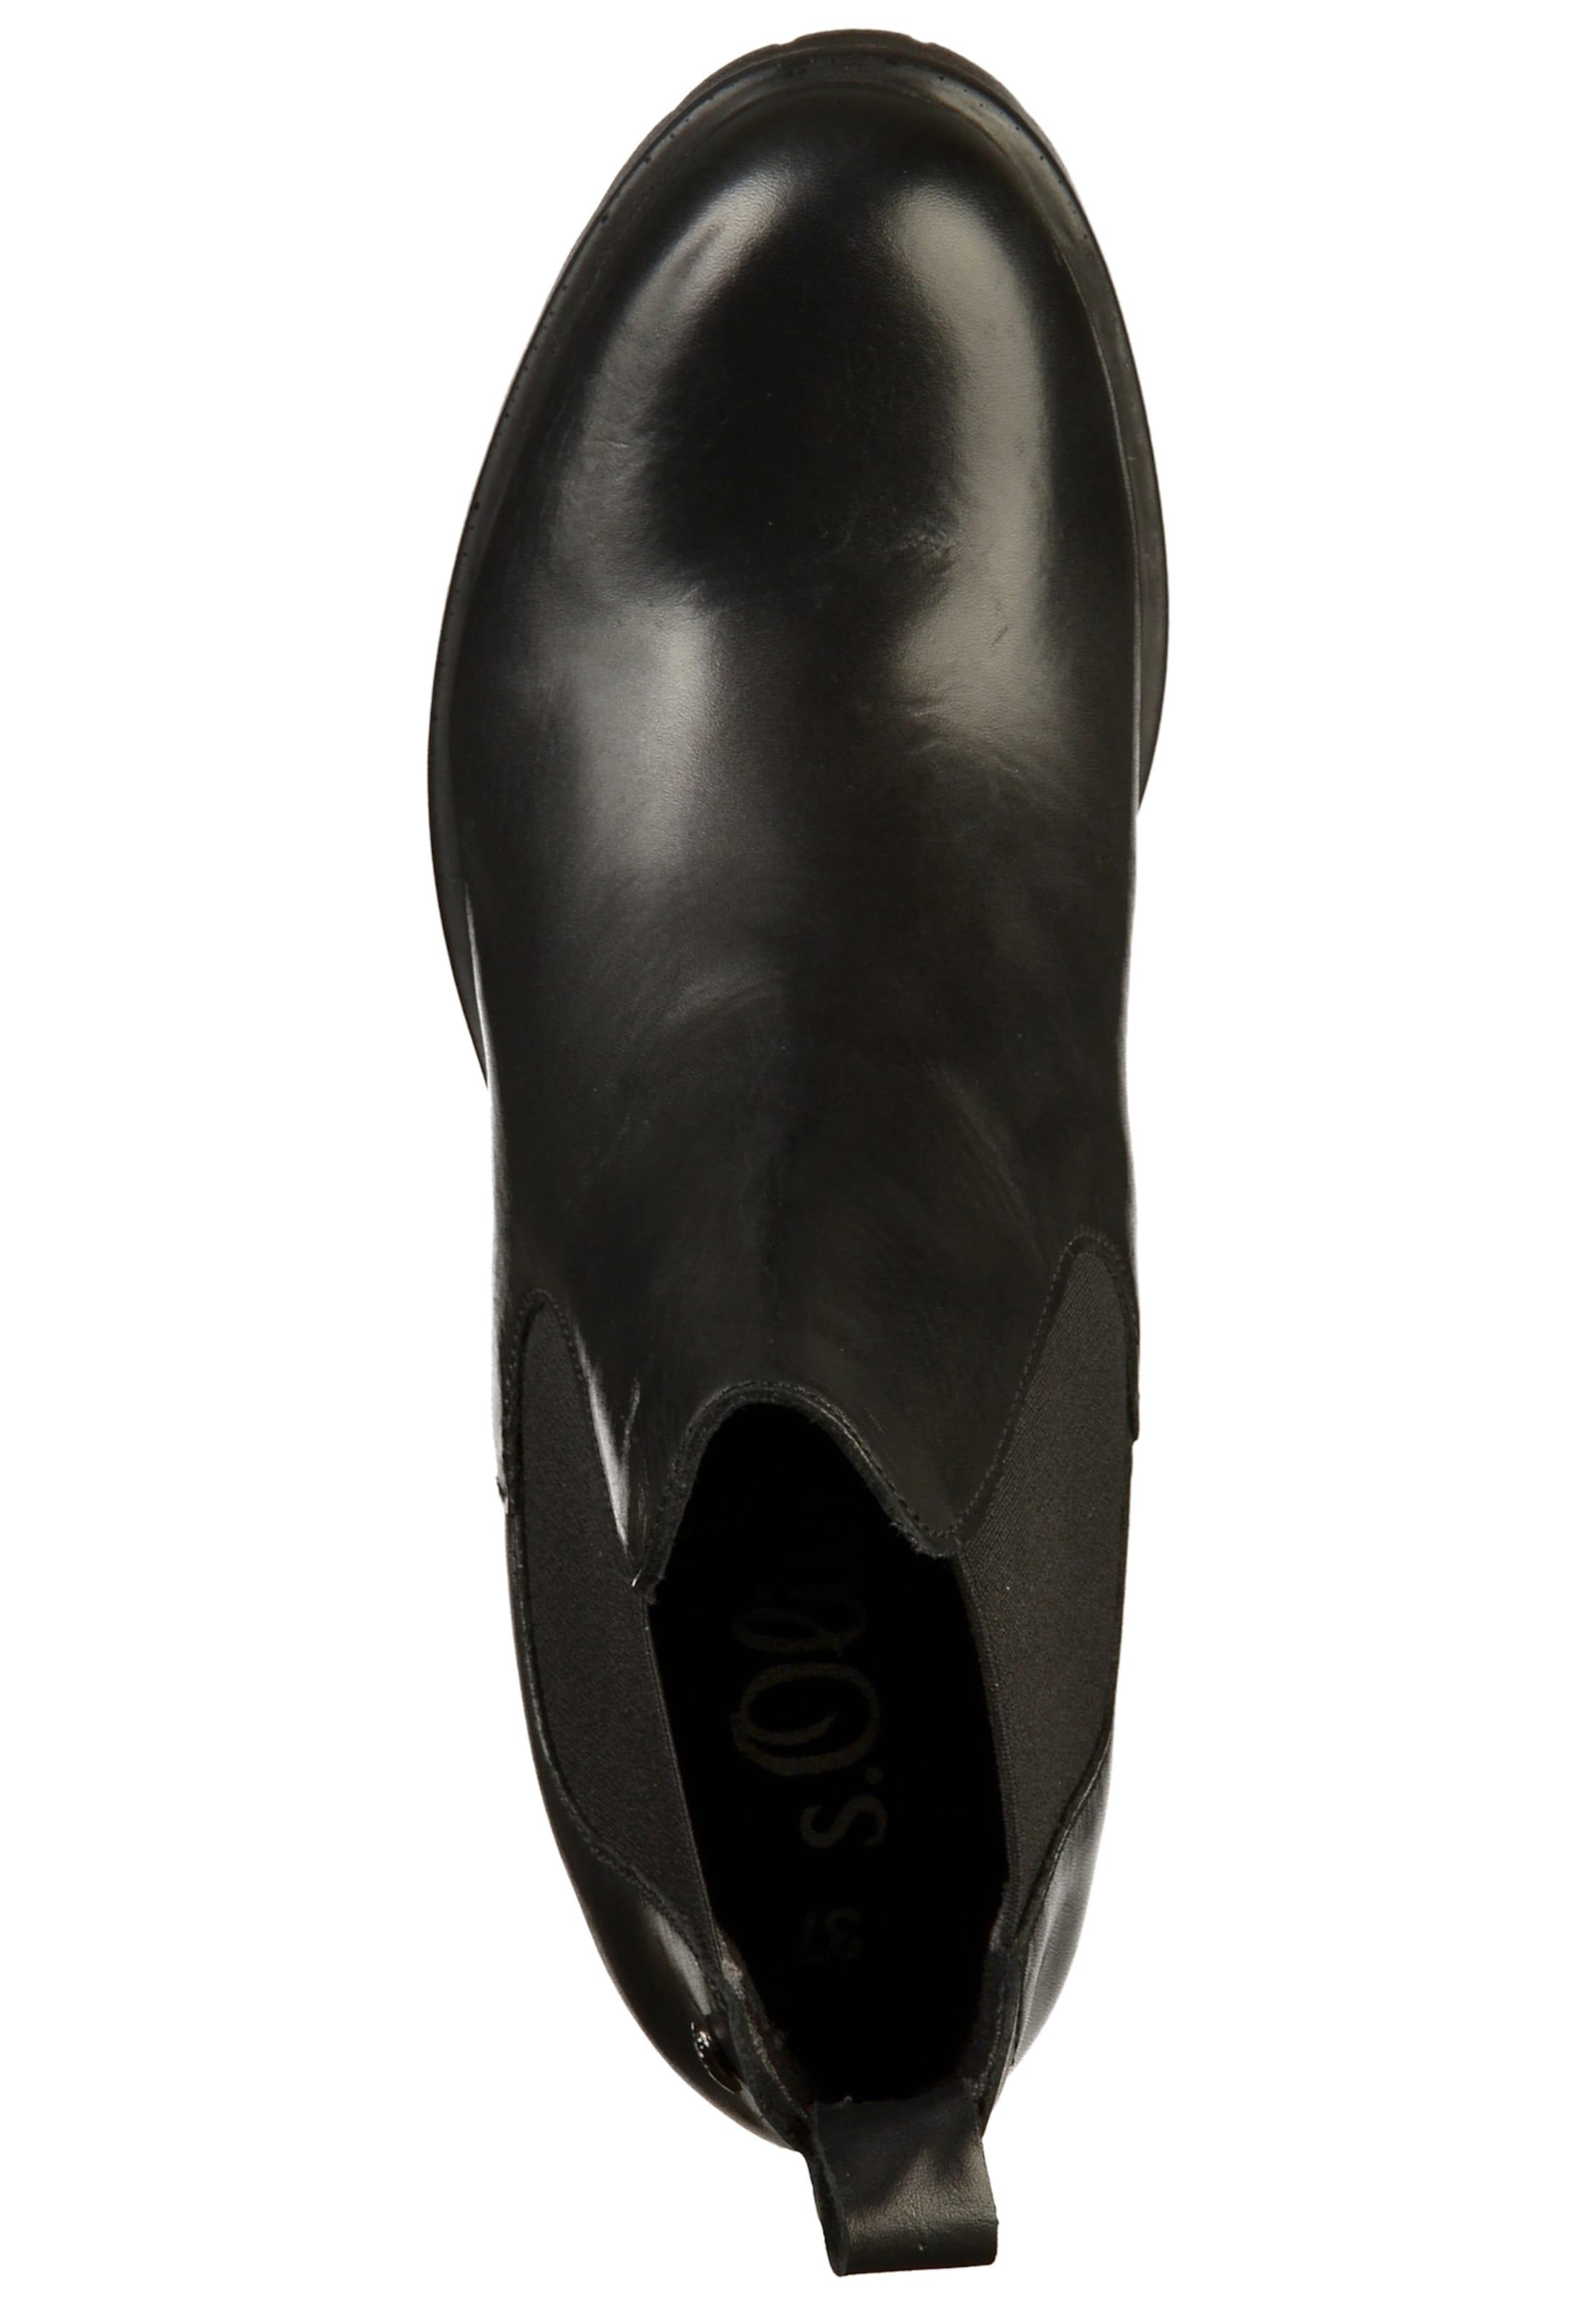 S Chelsea Red En oliver Boots Noir Label rxoedCB